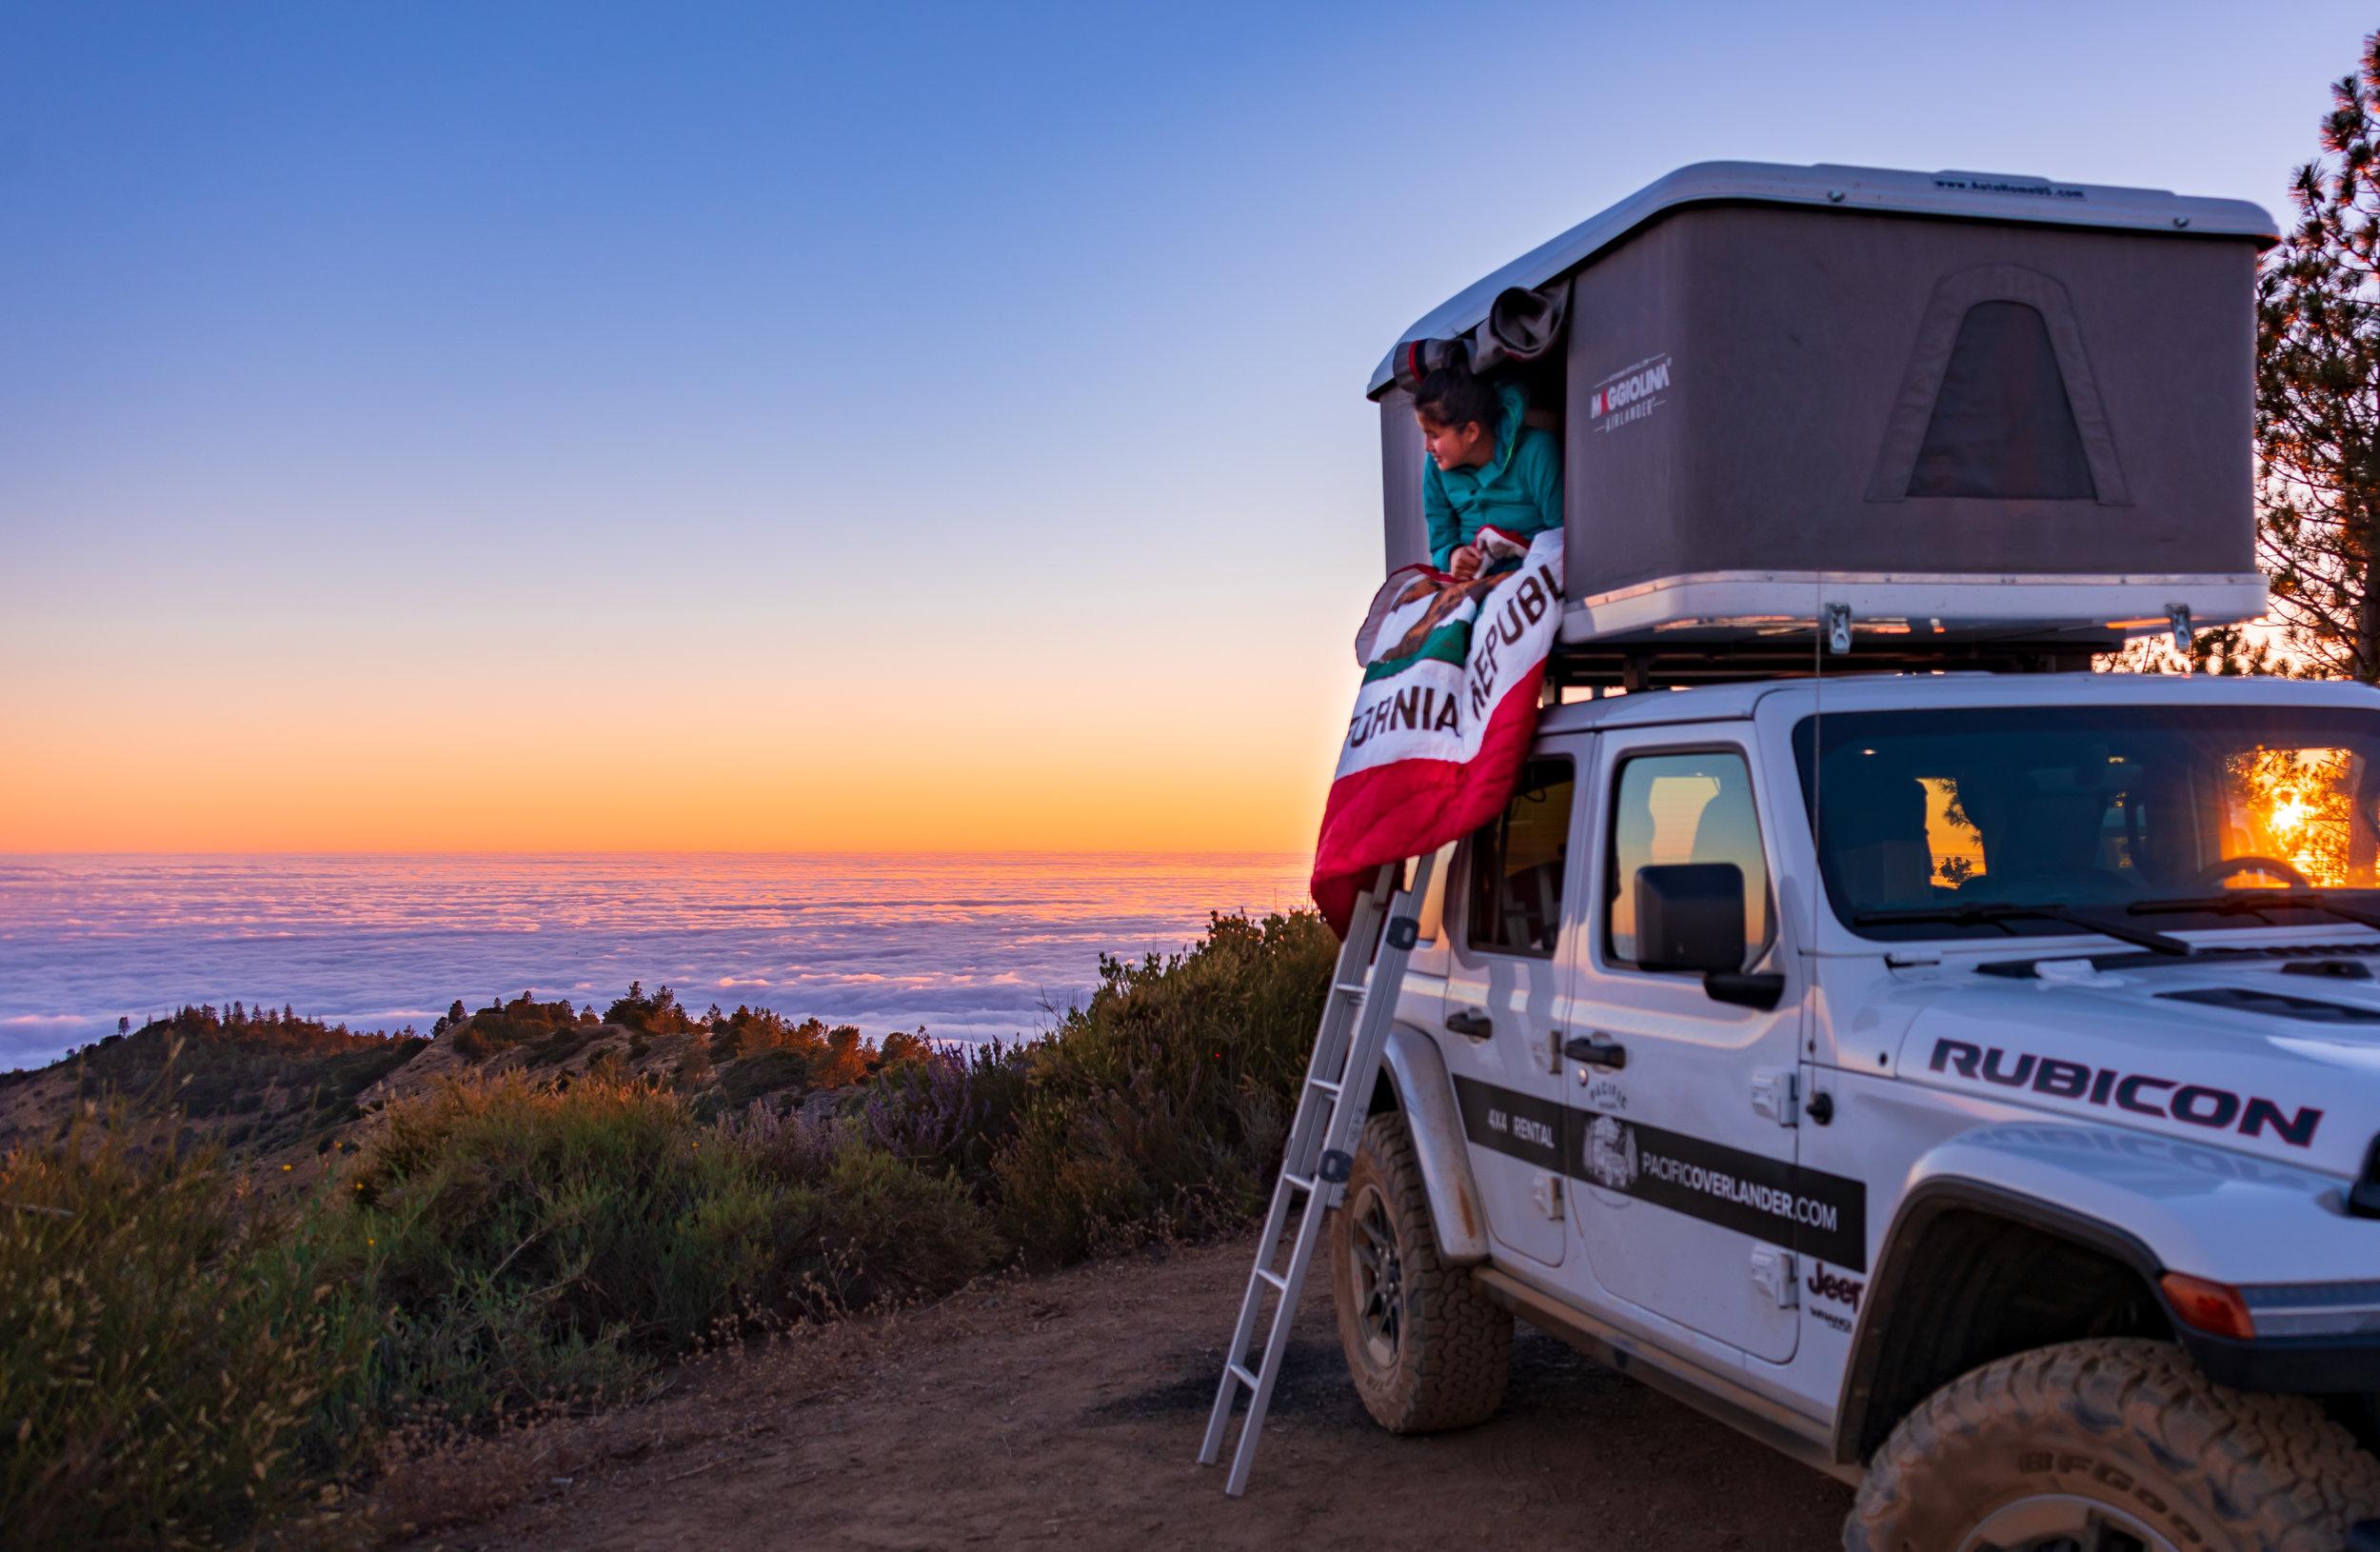 5 Day Central Coast Road Trip & Blog u2014 Pacific Overlander